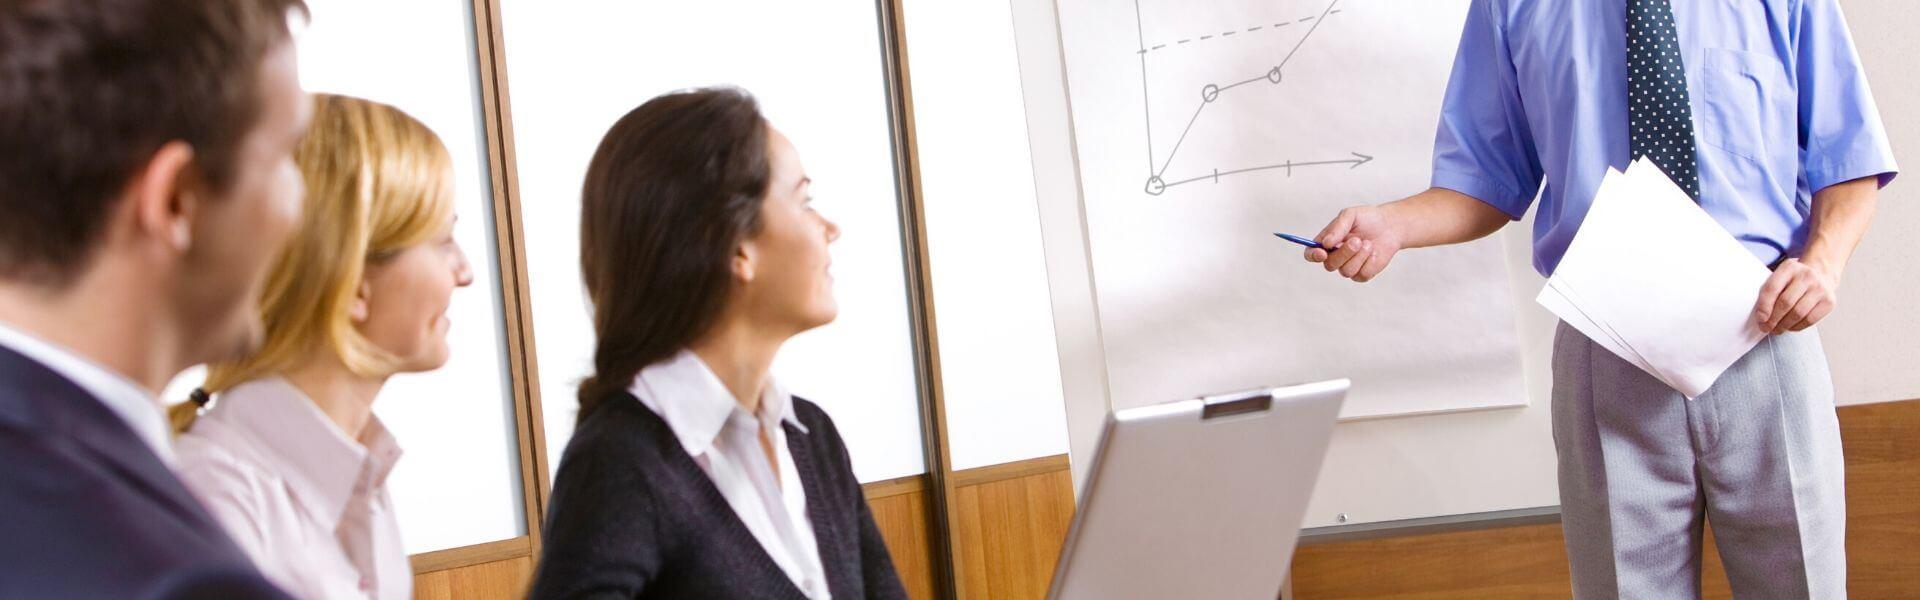 Zertifikatslehrgang KMU-Berater Sanierung und Turnaround